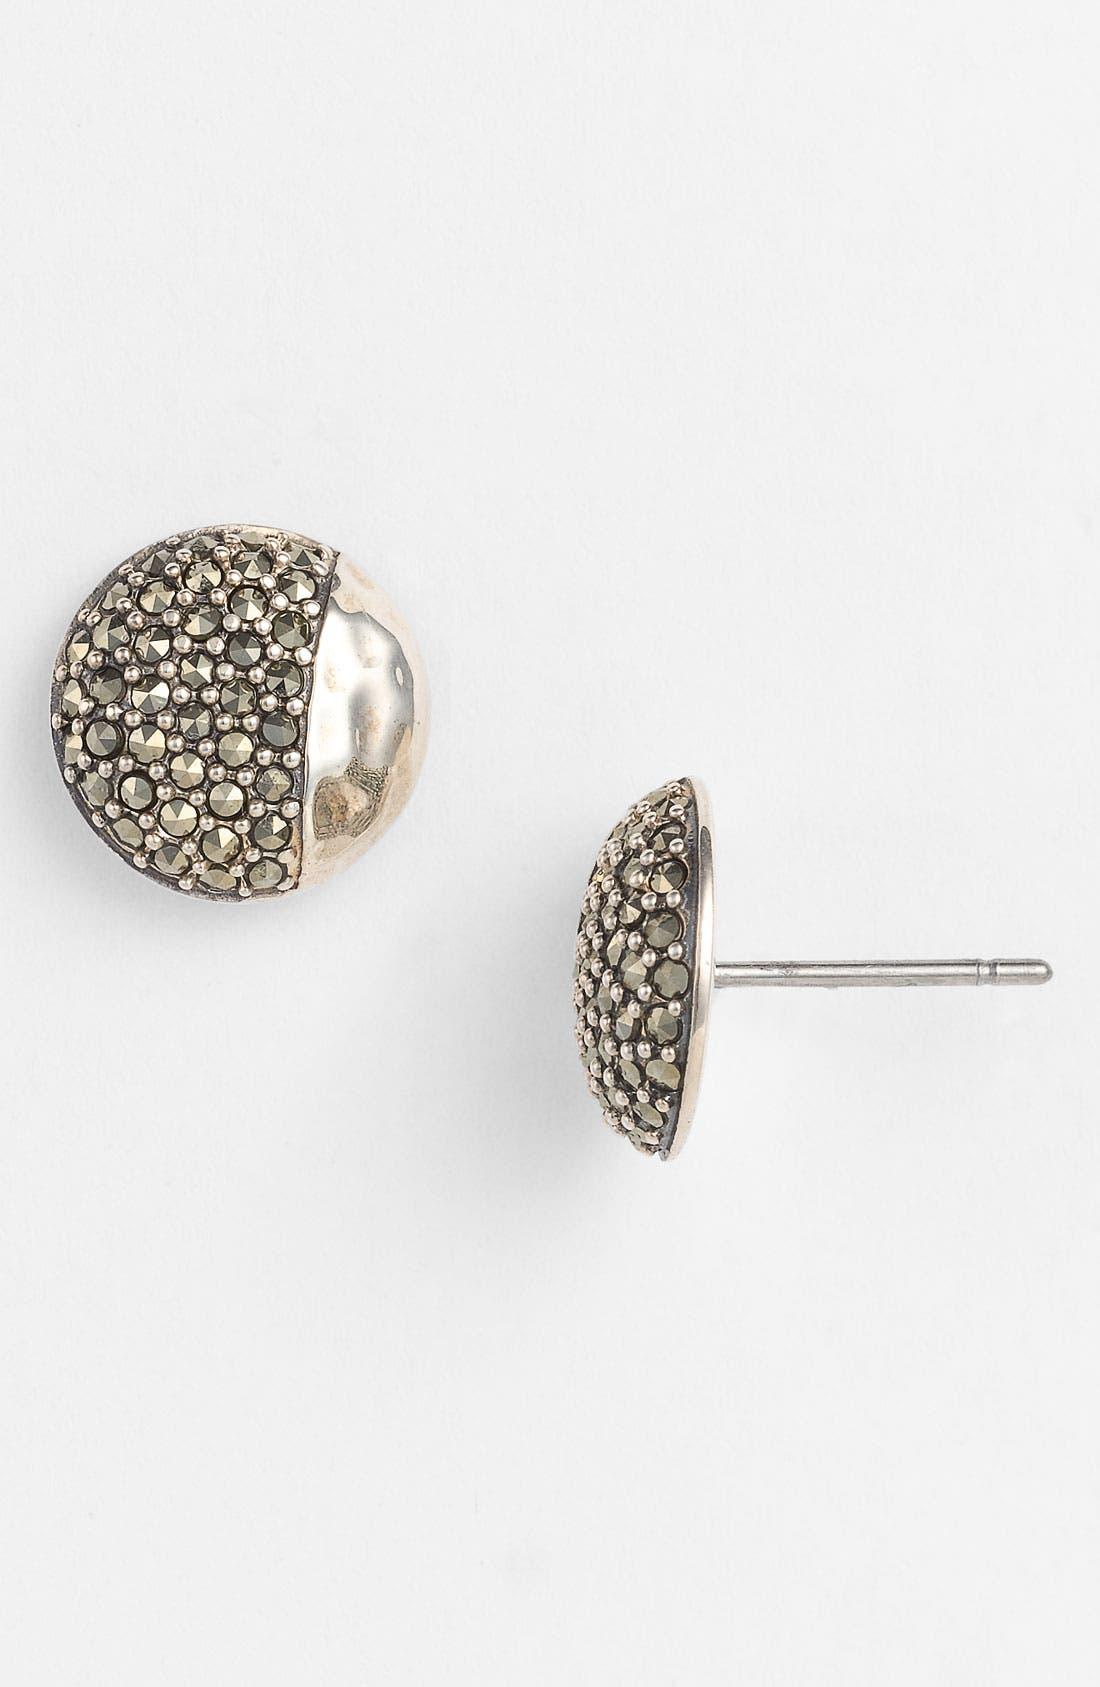 Main Image - Judith Jack 'Gold Sea' Button Stud Earrings